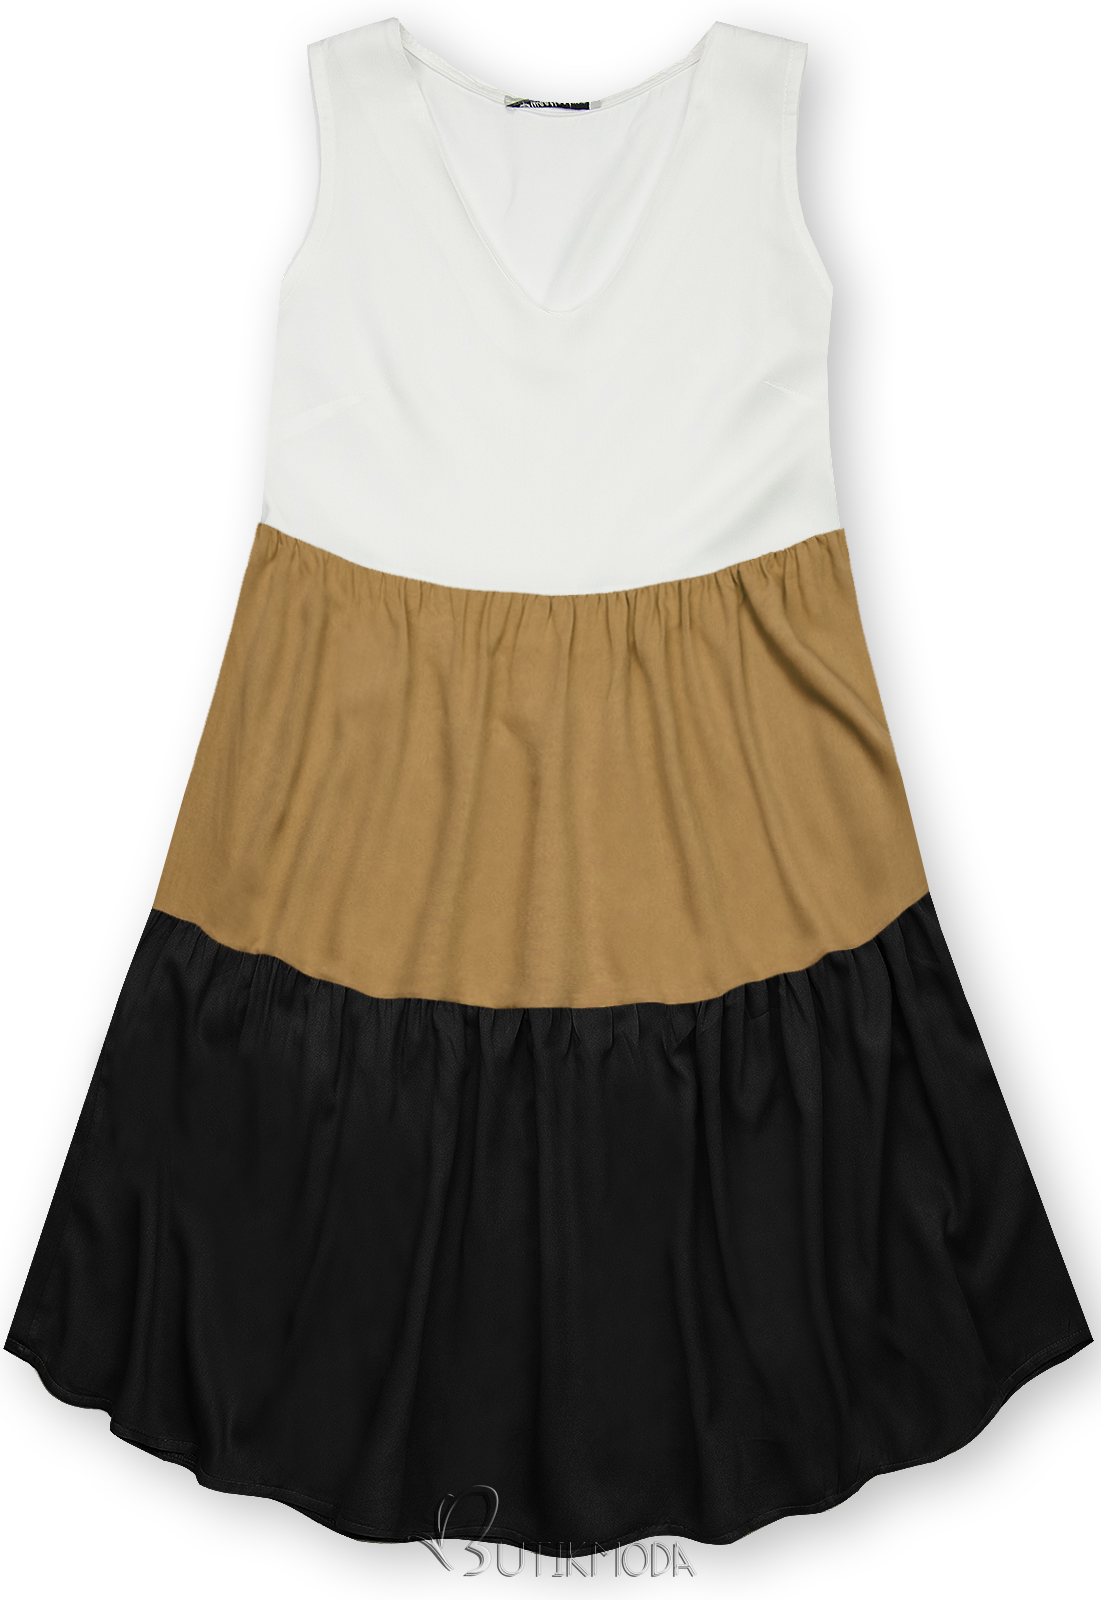 Kleid mit Color-Blocking-Optik braun/schwarz